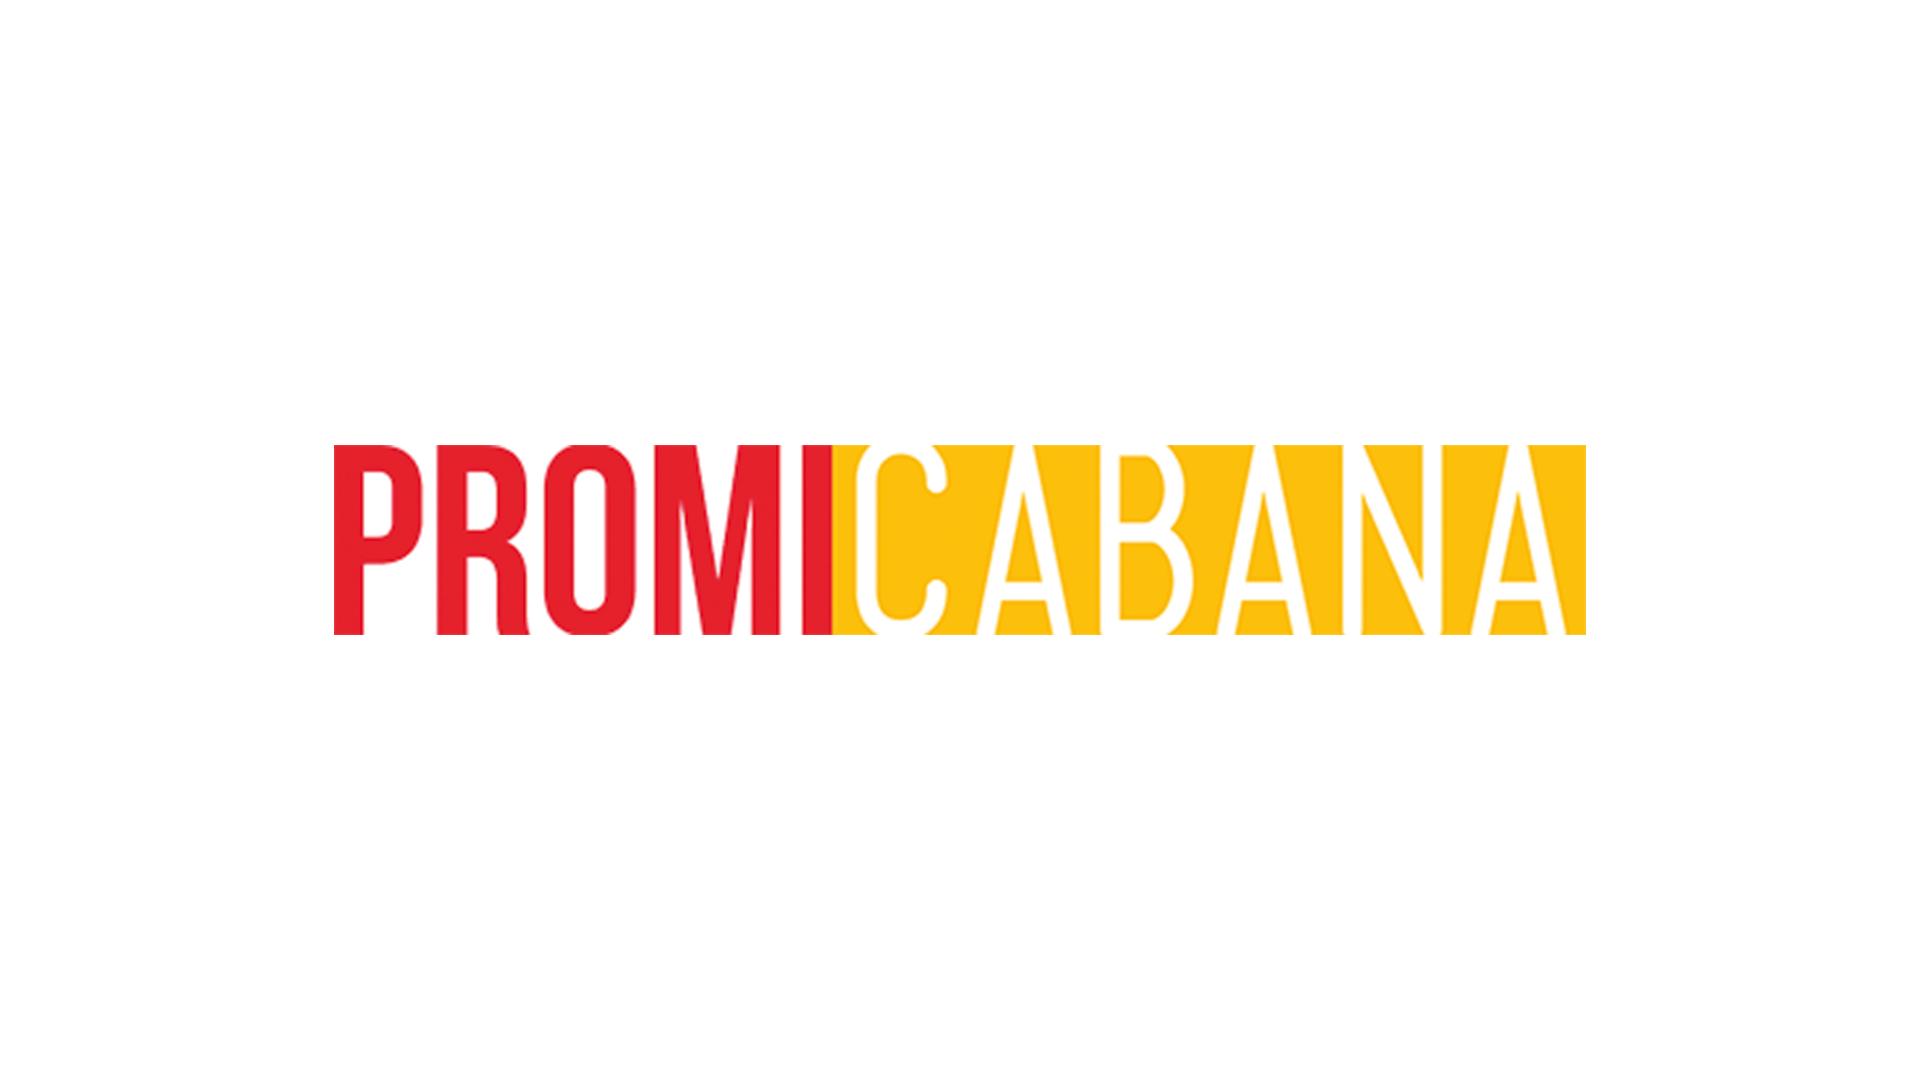 Justin-Bieber-Whitney-Elementary-School-Las-Vegas